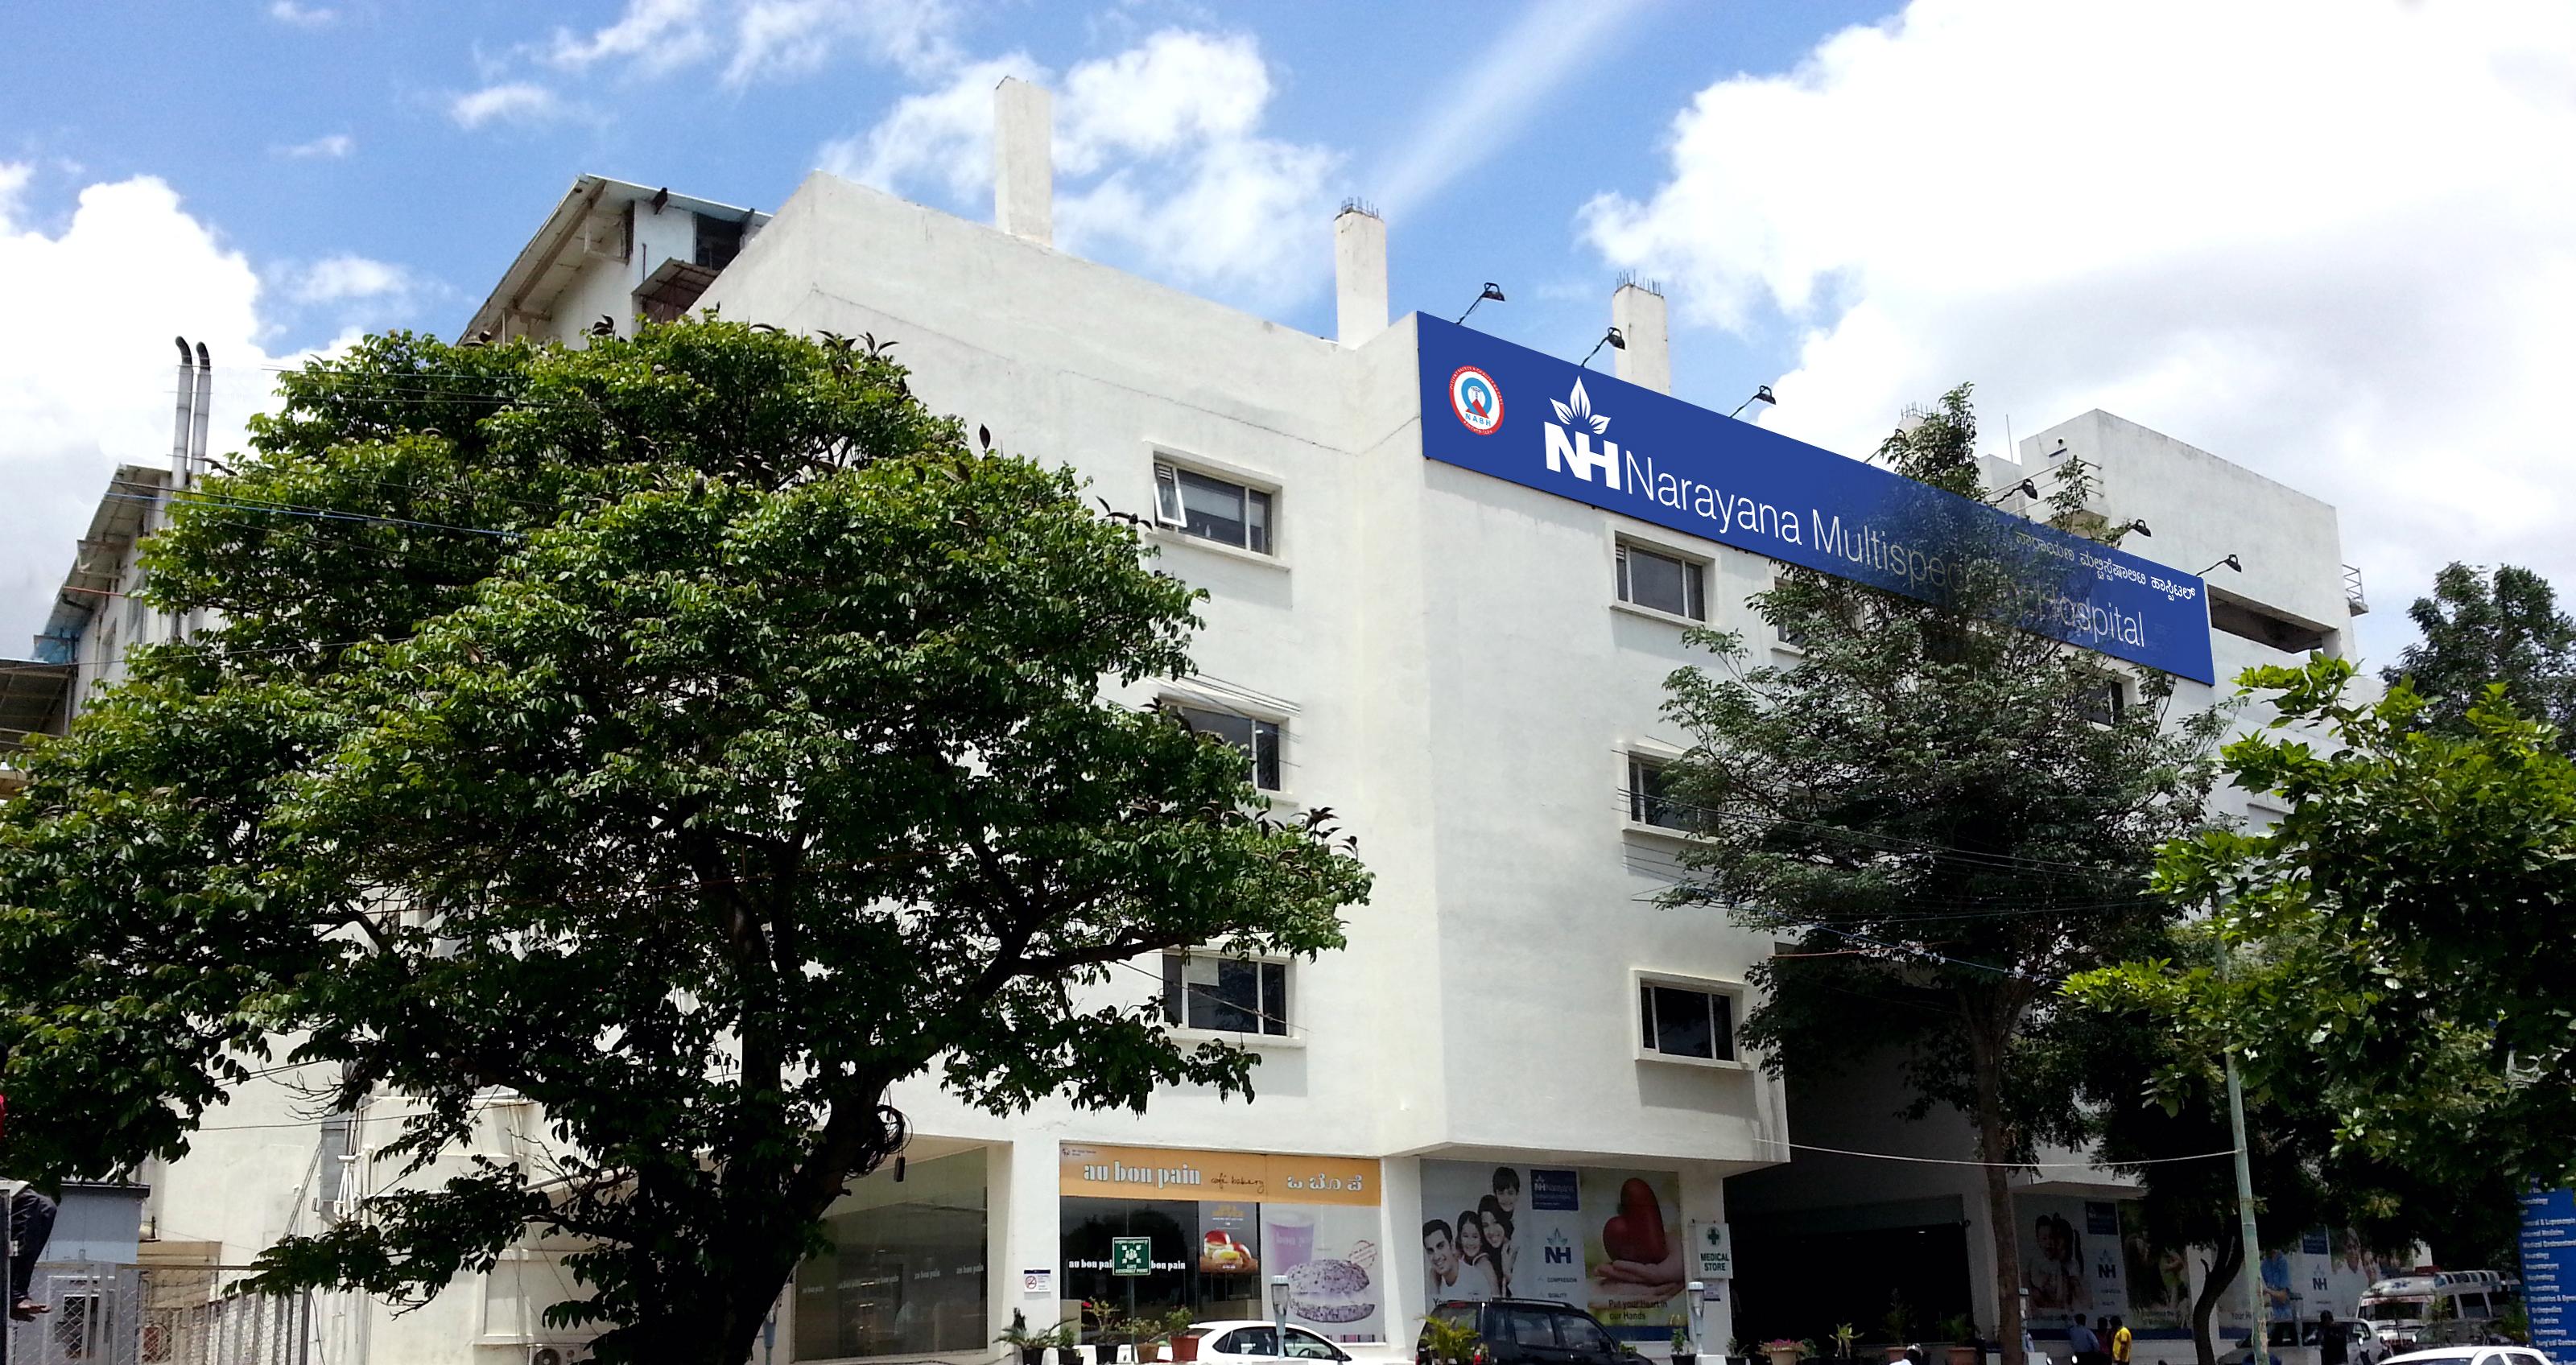 Narayana Multispeciality Hospital, Whitefield - Wikipedia